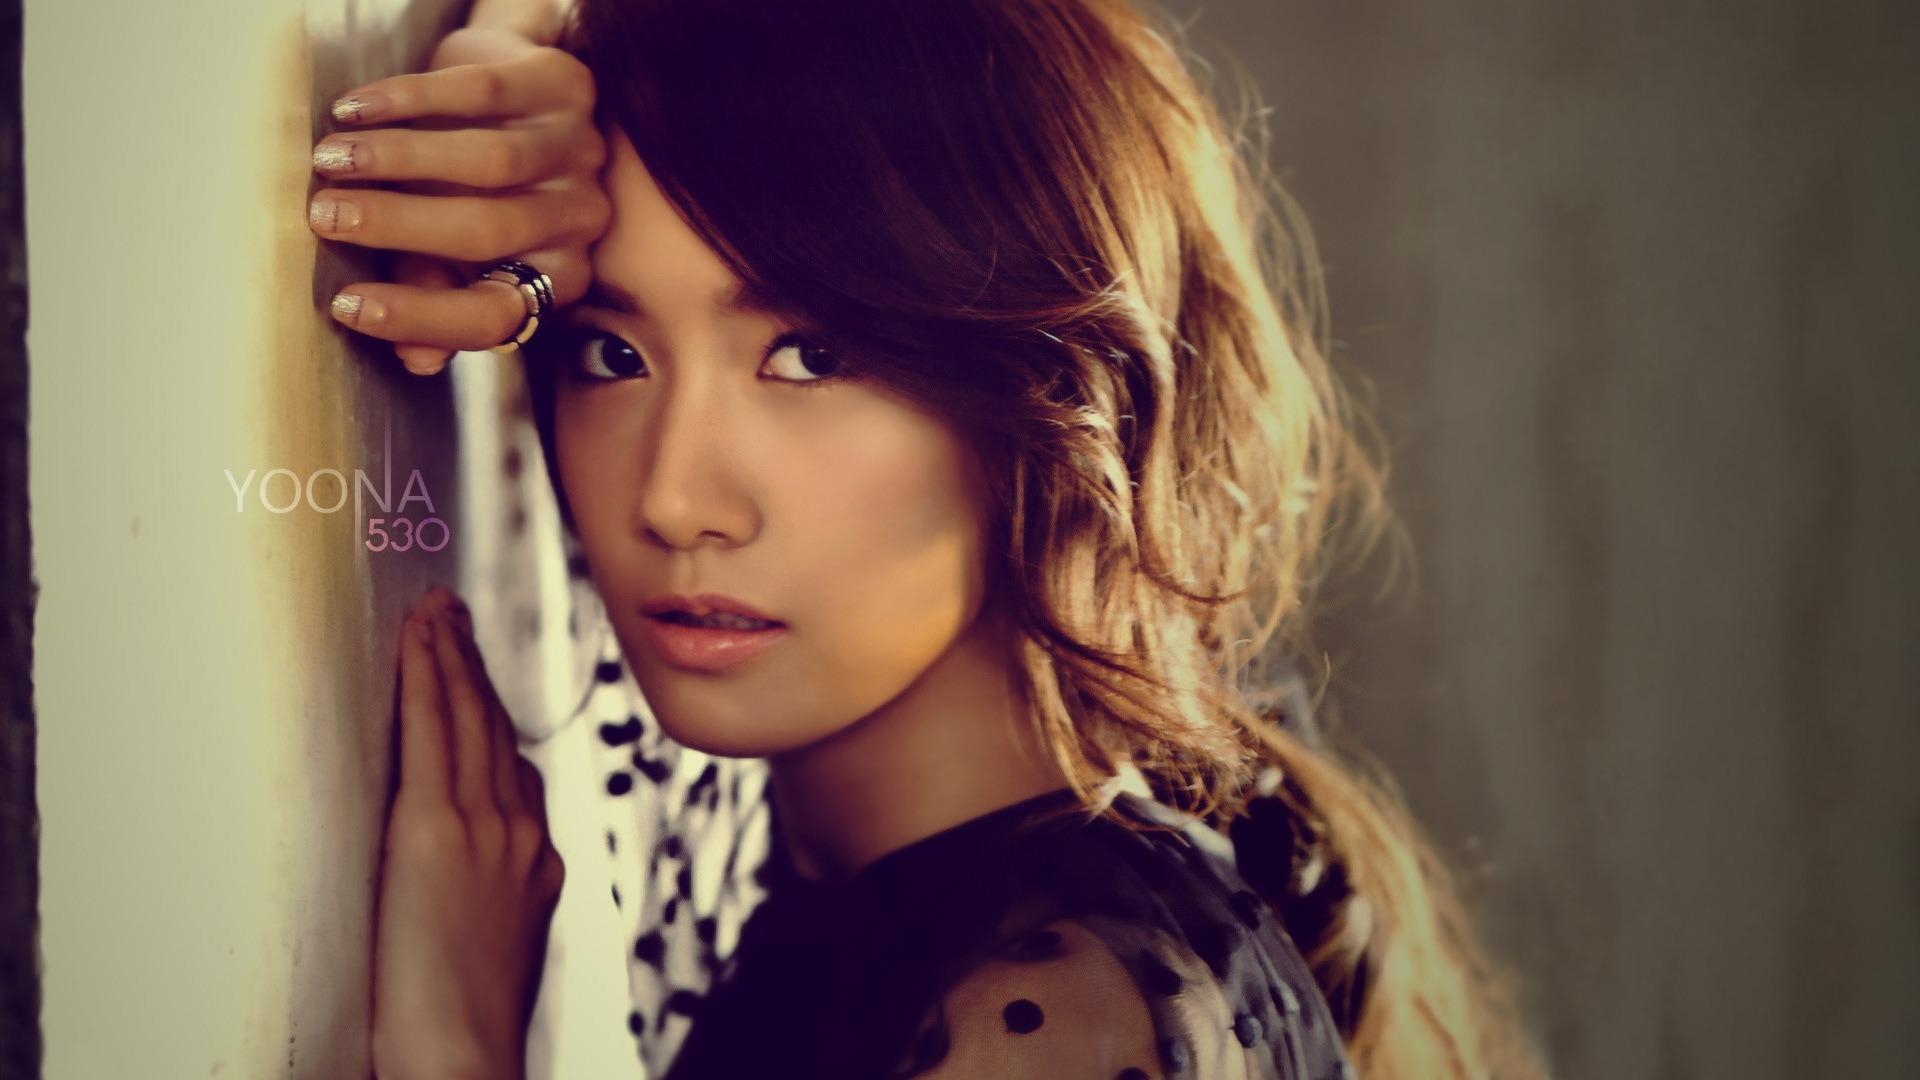 Yoona Desktop Wallpaper Hd | CloudPix